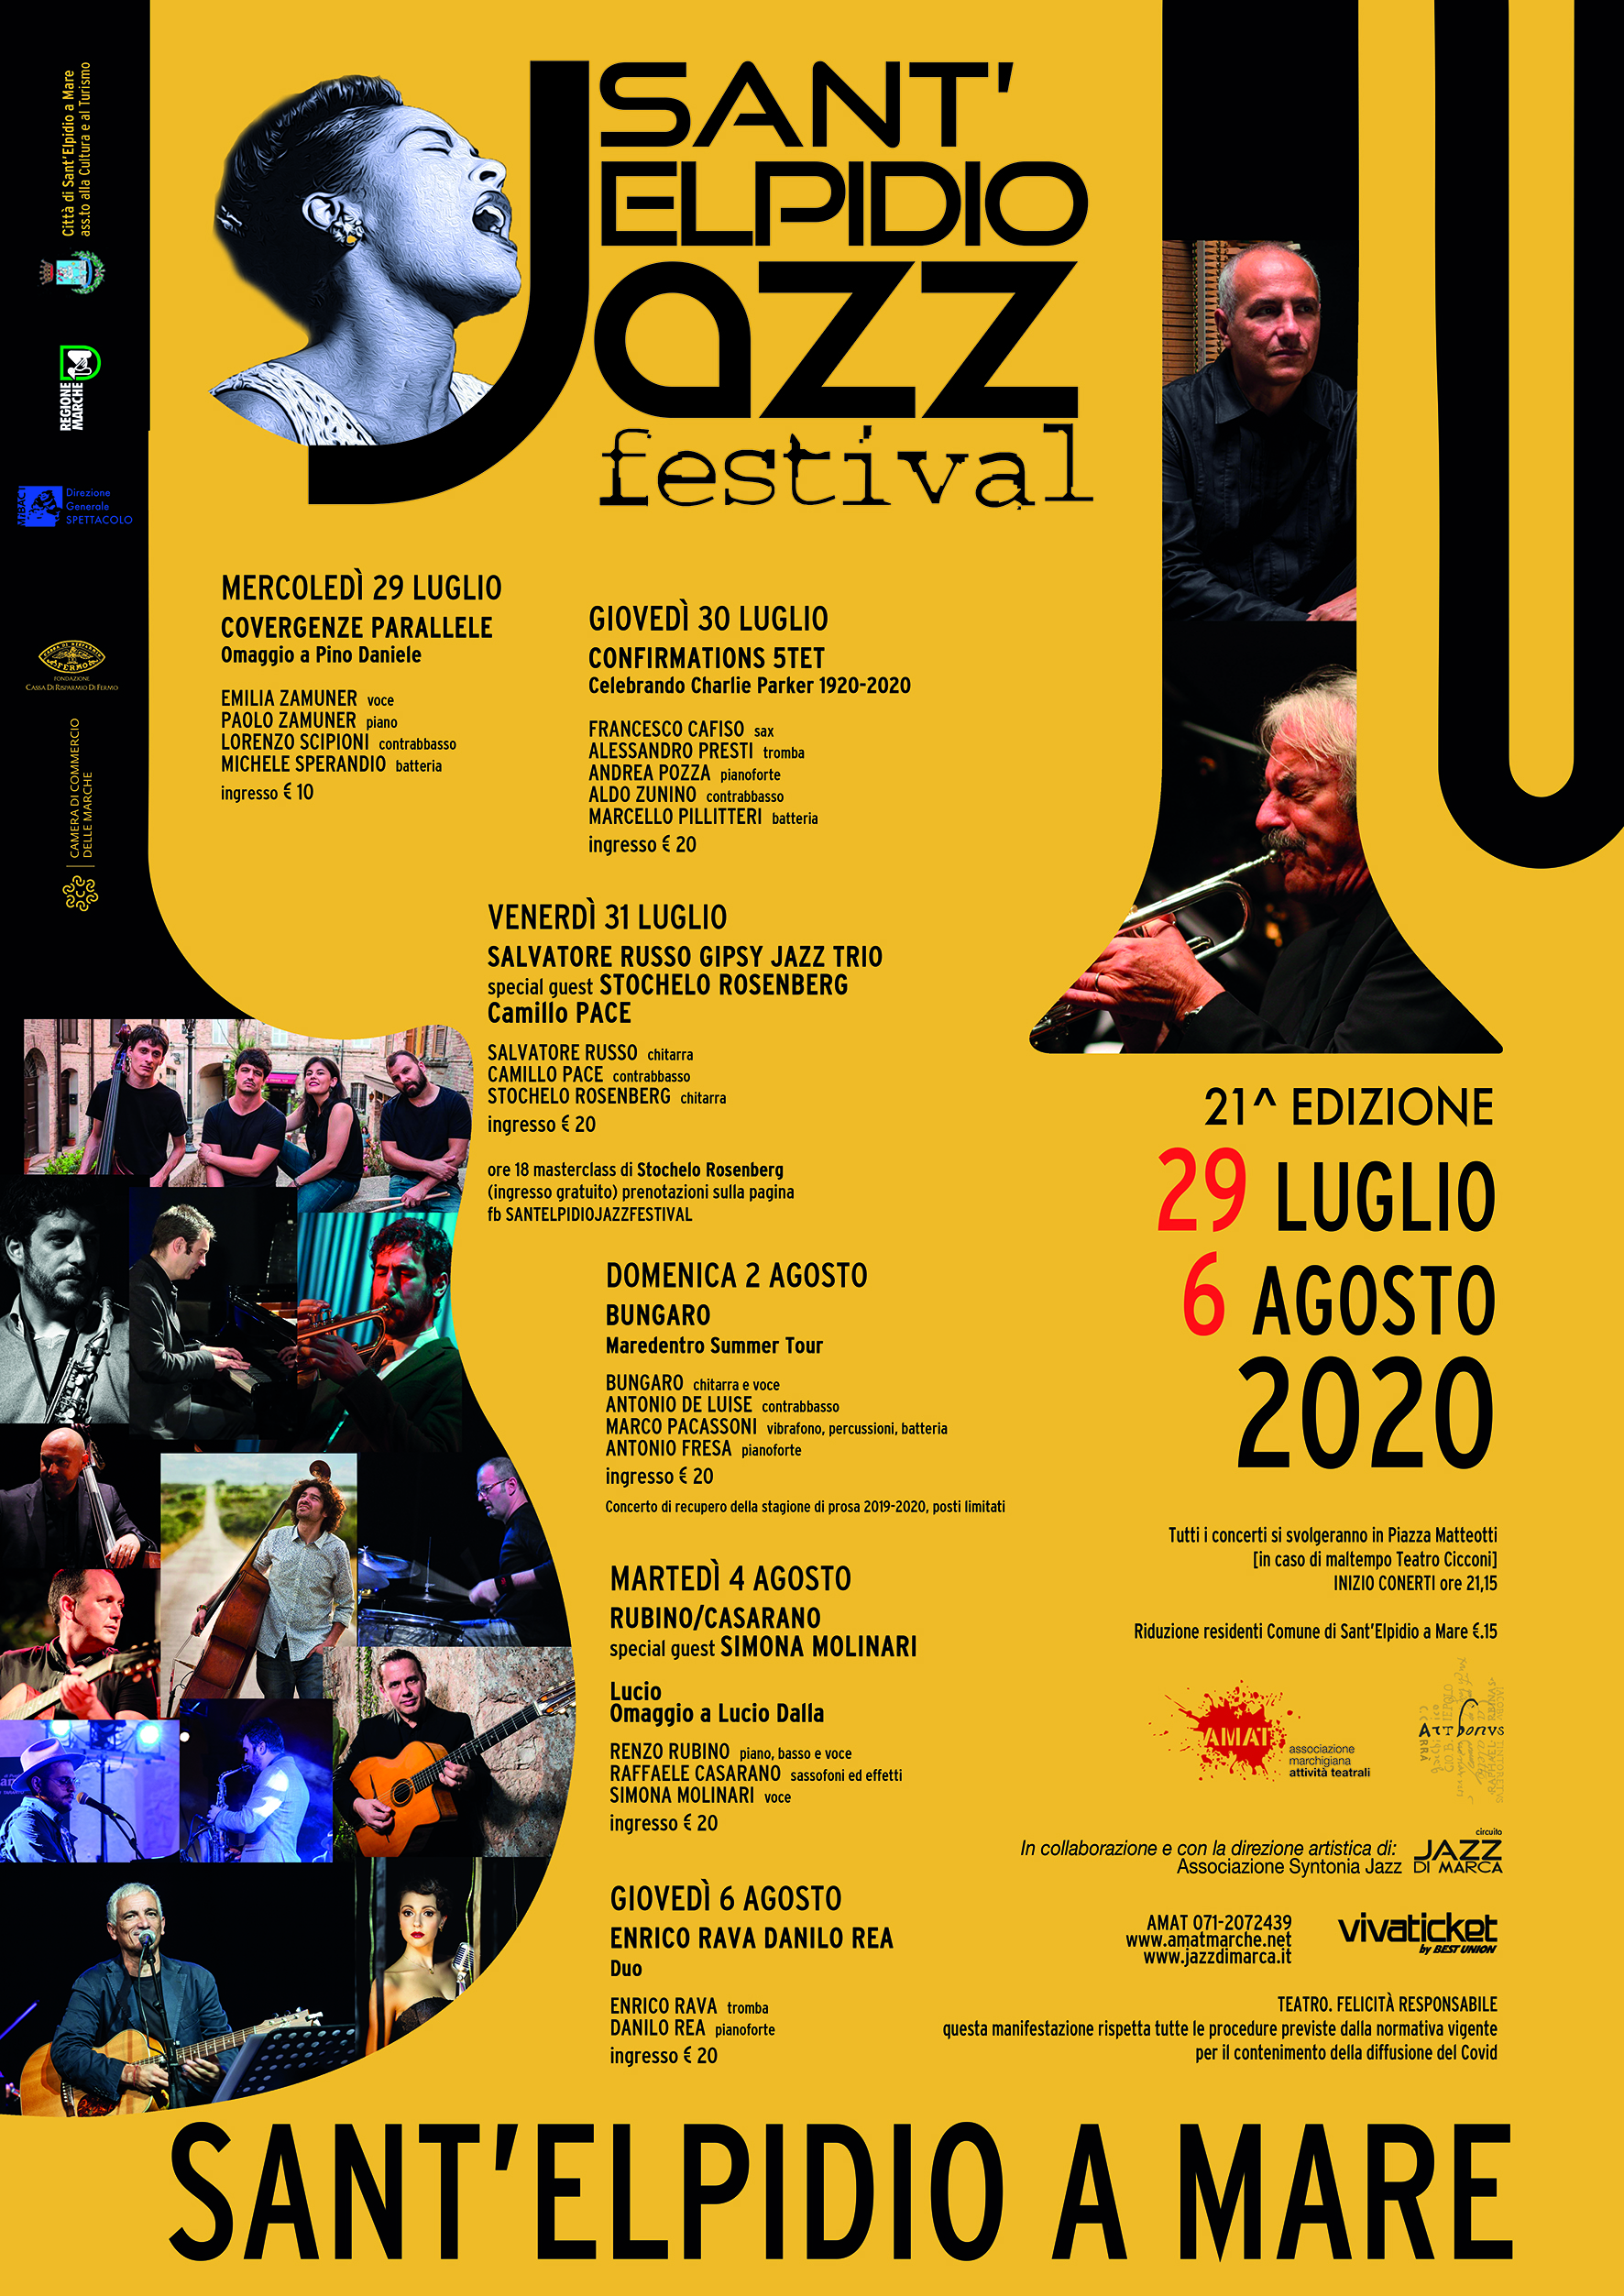 Sant'Elpidio a Mare | Sant'Elpidio Jazz Festival 2020